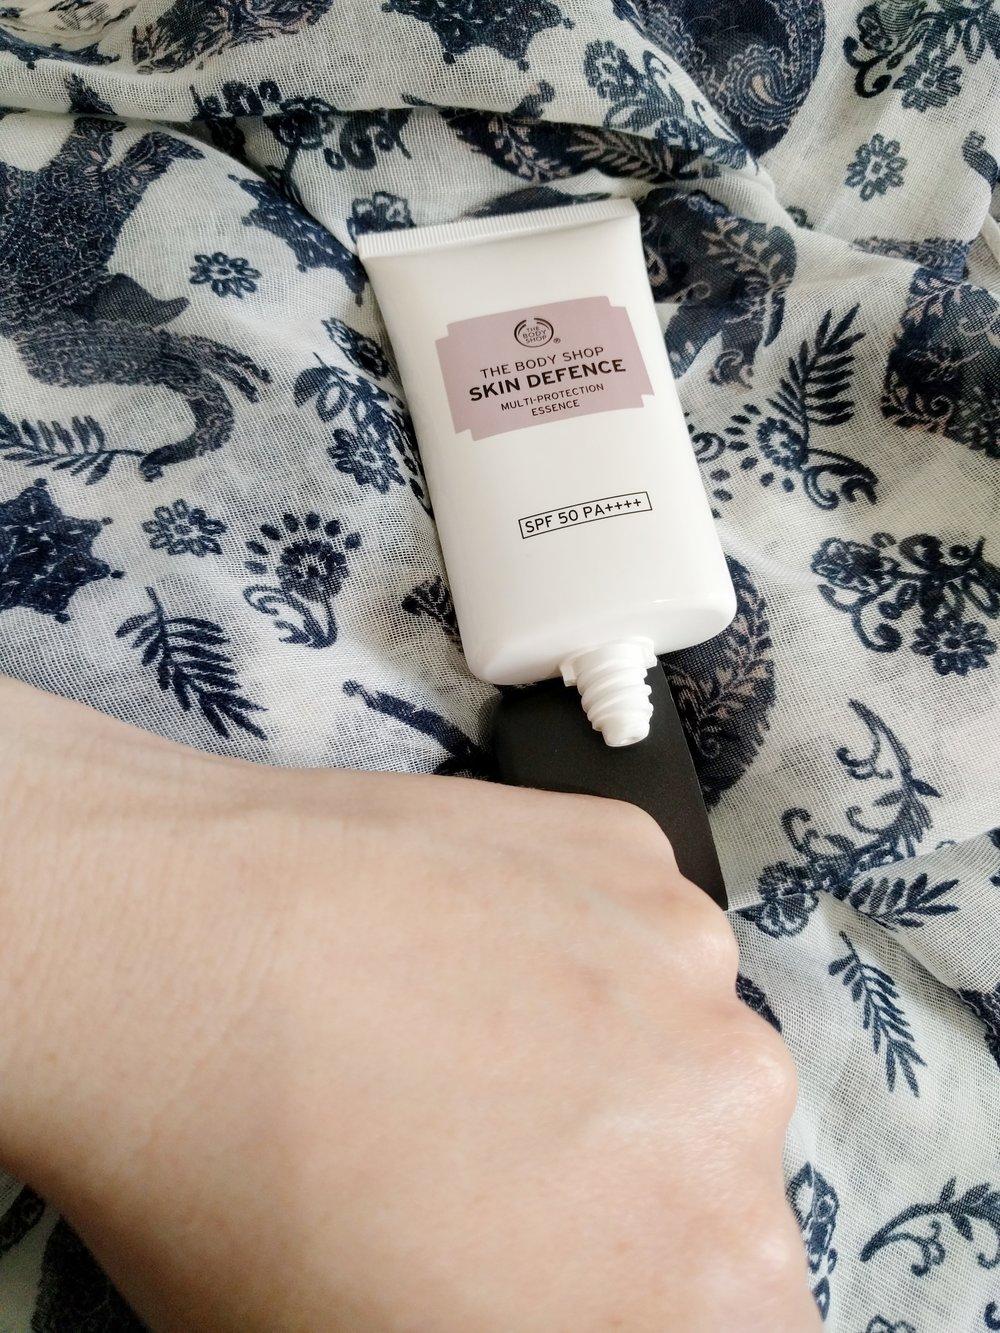 Body Shop Skin Defence 4.jpg